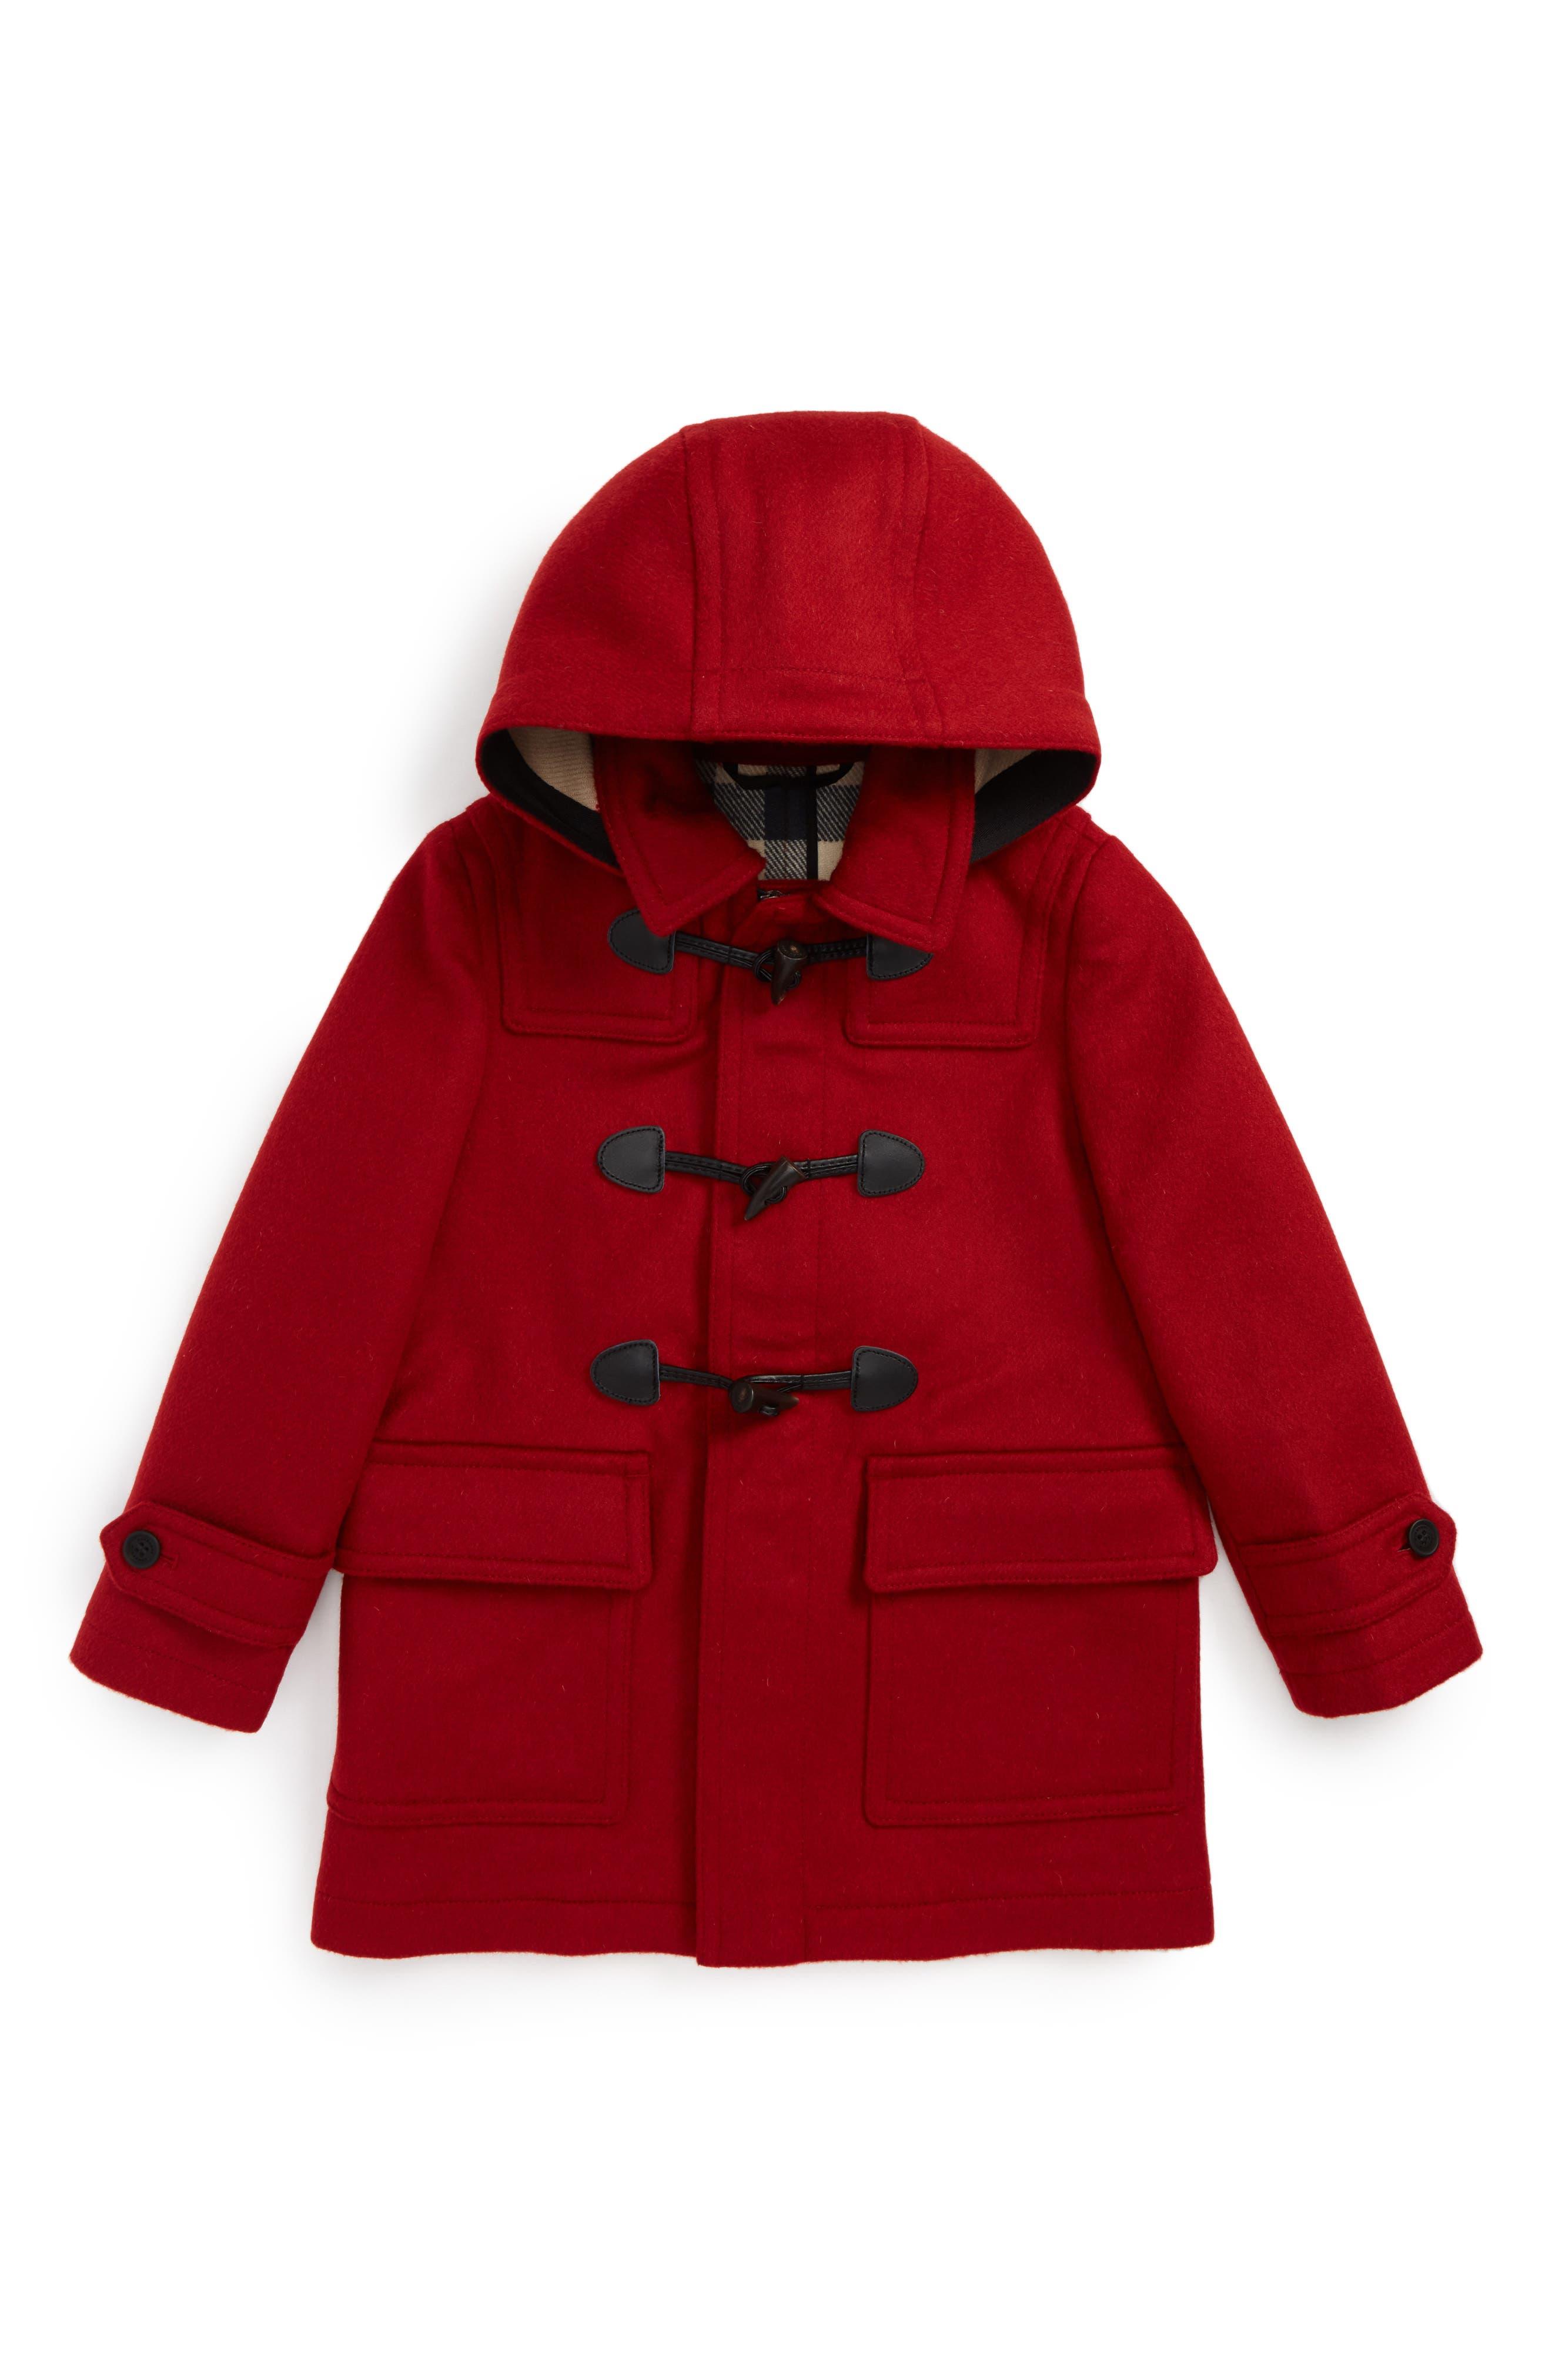 Alternate Image 1 Selected - Burberry Burwood Wool Toggle Coat (Little Boys & Big Boys)